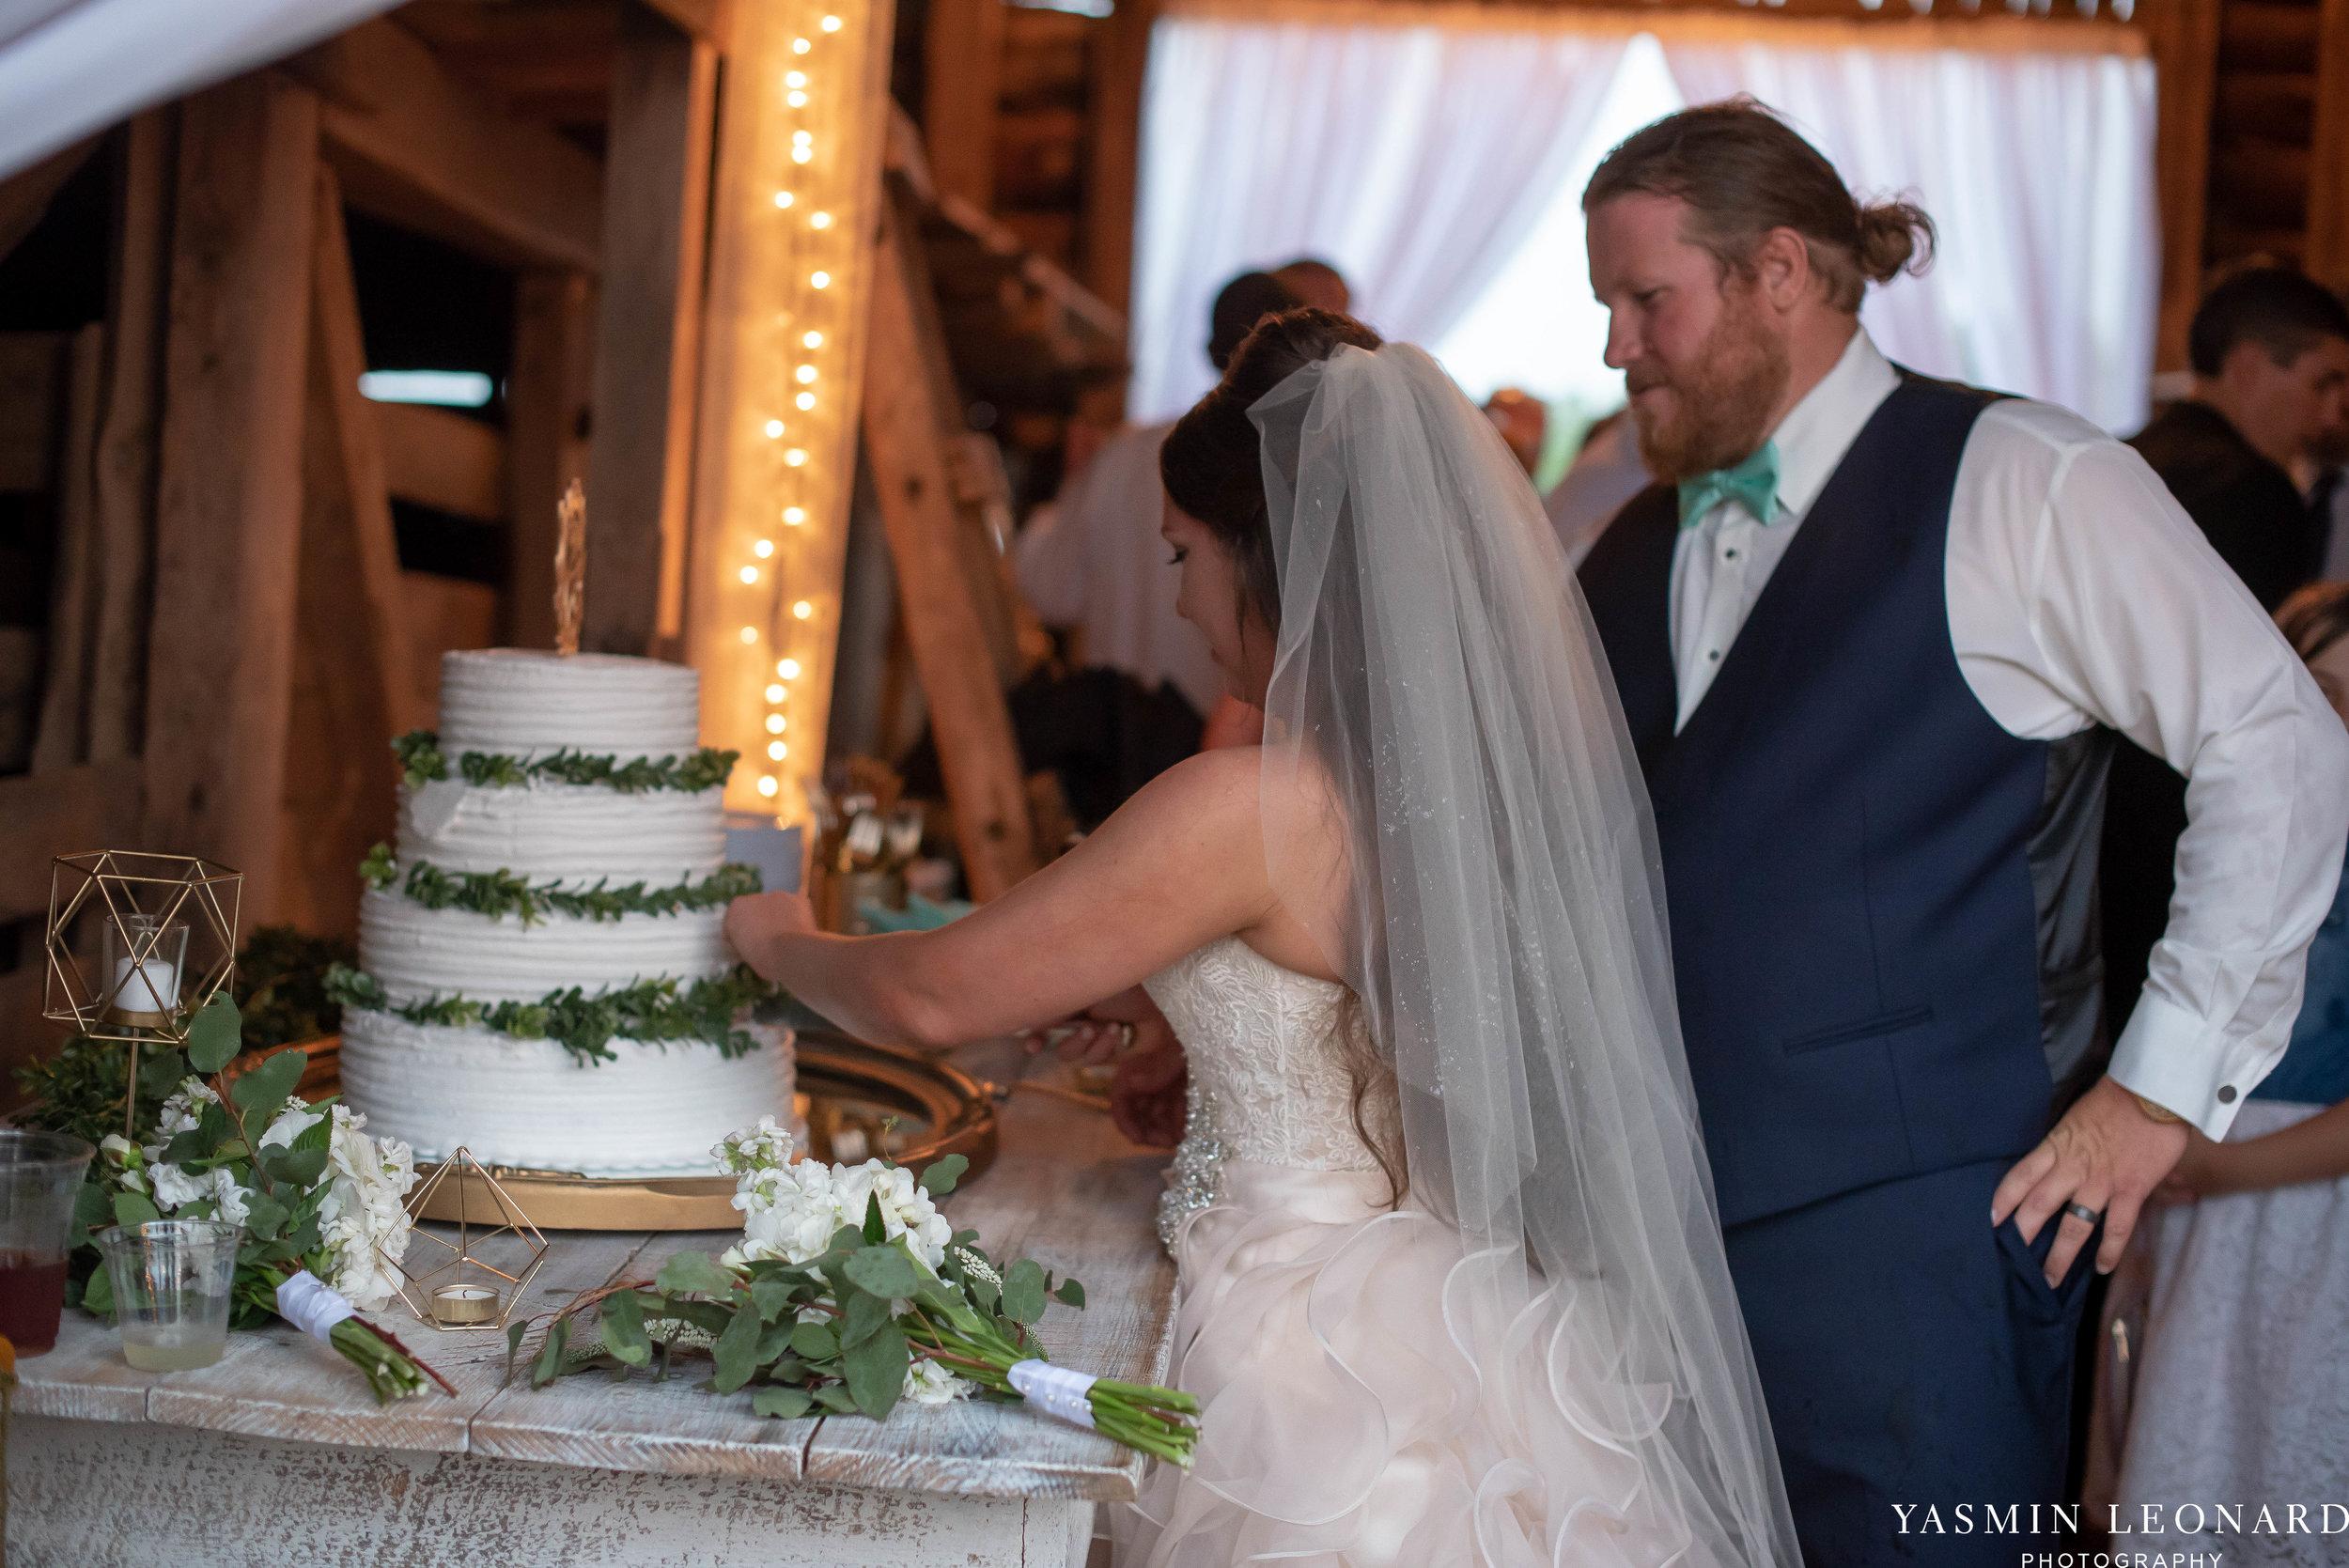 Rain on your wedding day - Rainy Wedding - Plan B for Rain - What to do if it rains on your wedding day - Wedding Inspiration - Outdoor wedding ideas - Rainy Wedding Pictures - Yasmin Leonard Photography-65.jpg